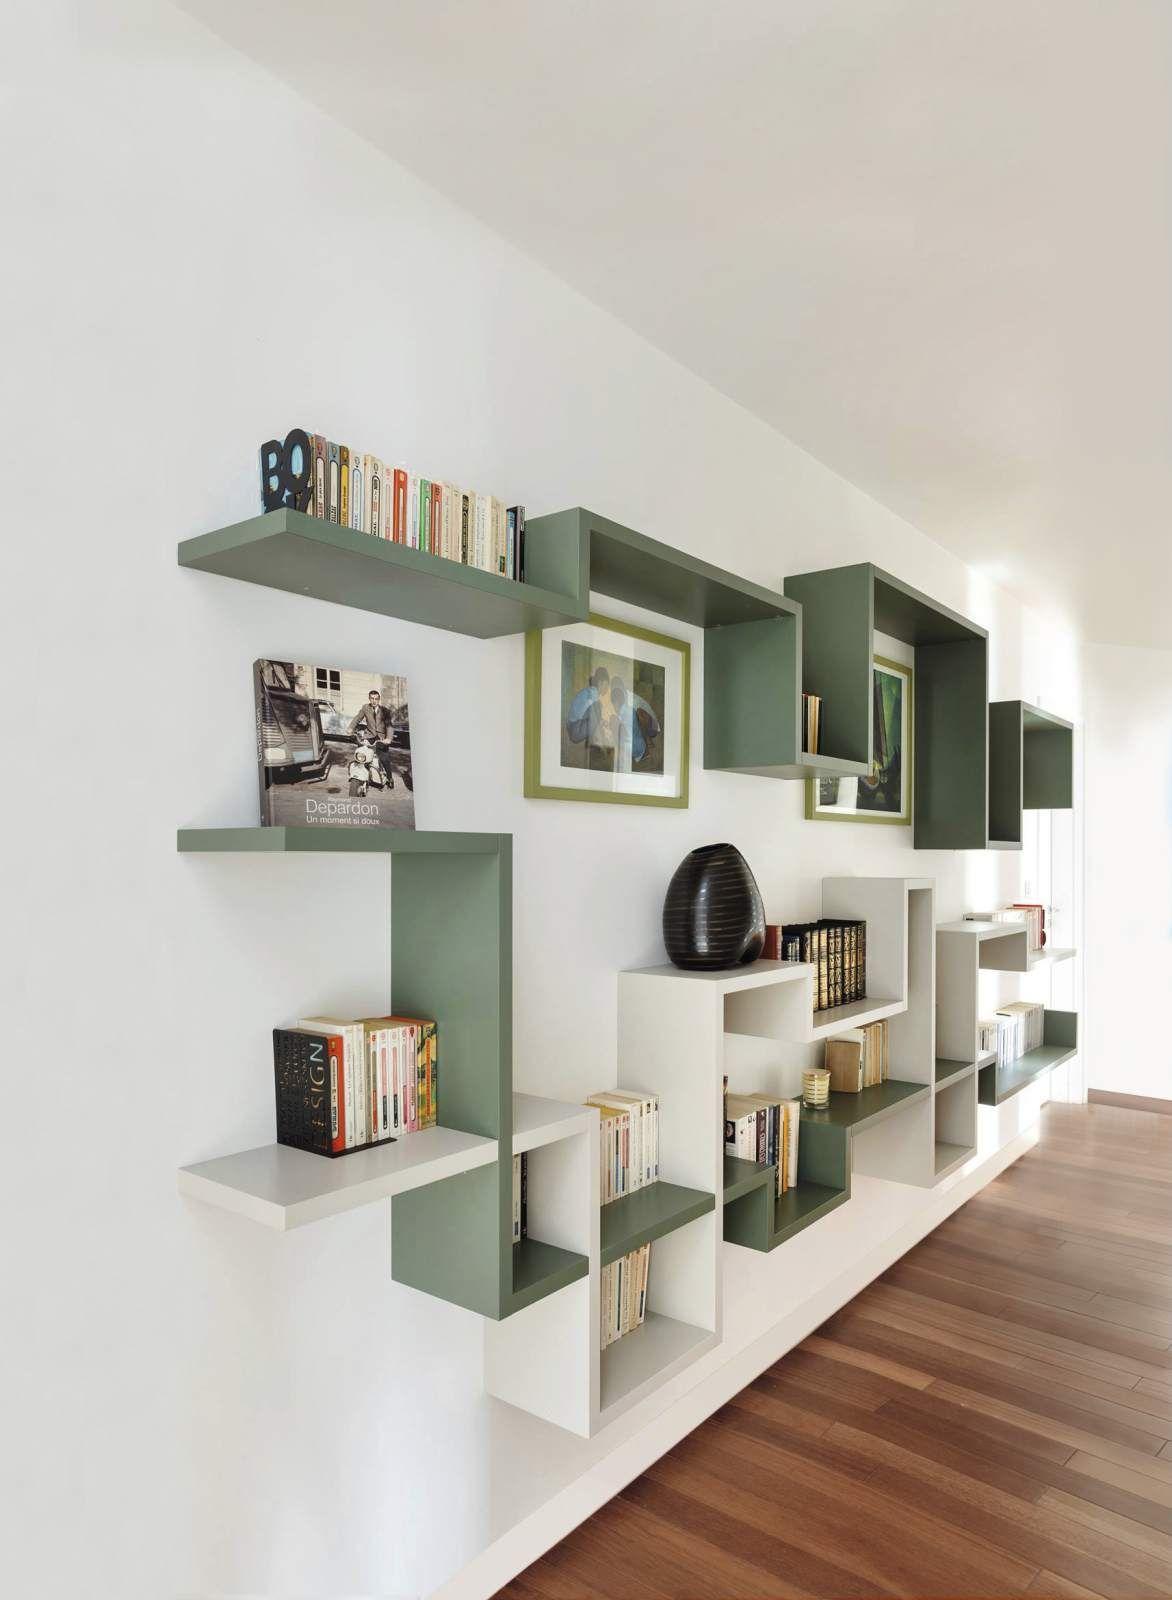 42 Ideas For Living Room Small Rustic Beams Livingroom: 15+ Creative Rustic Living Room Remodel Joanna Gaines